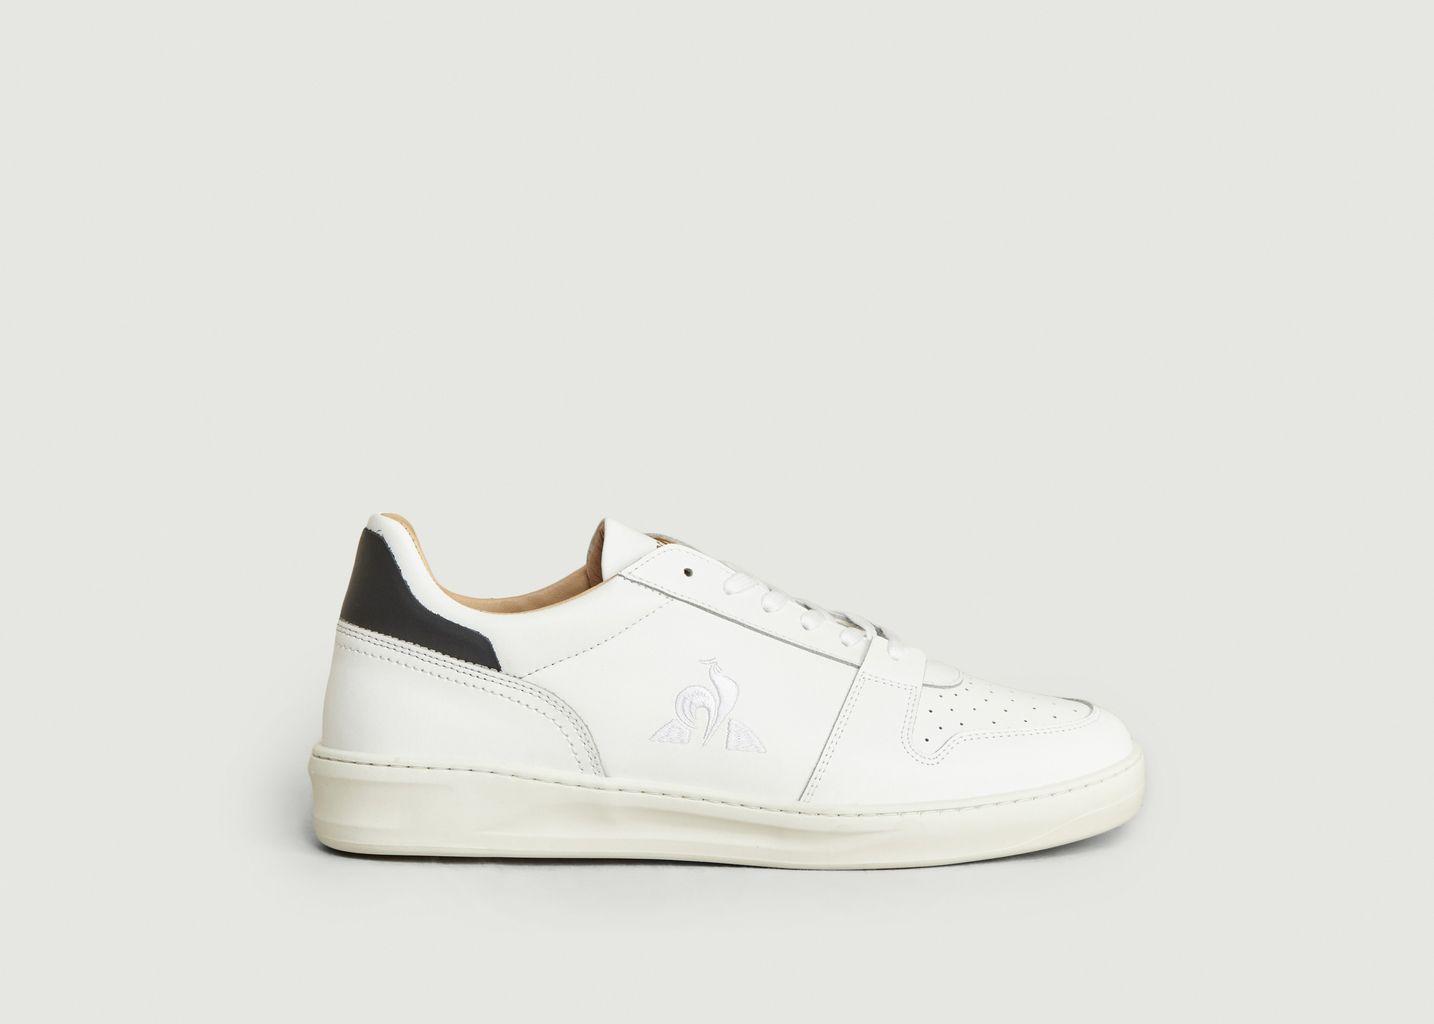 Sneakers Esthete - Le Coq Sportif